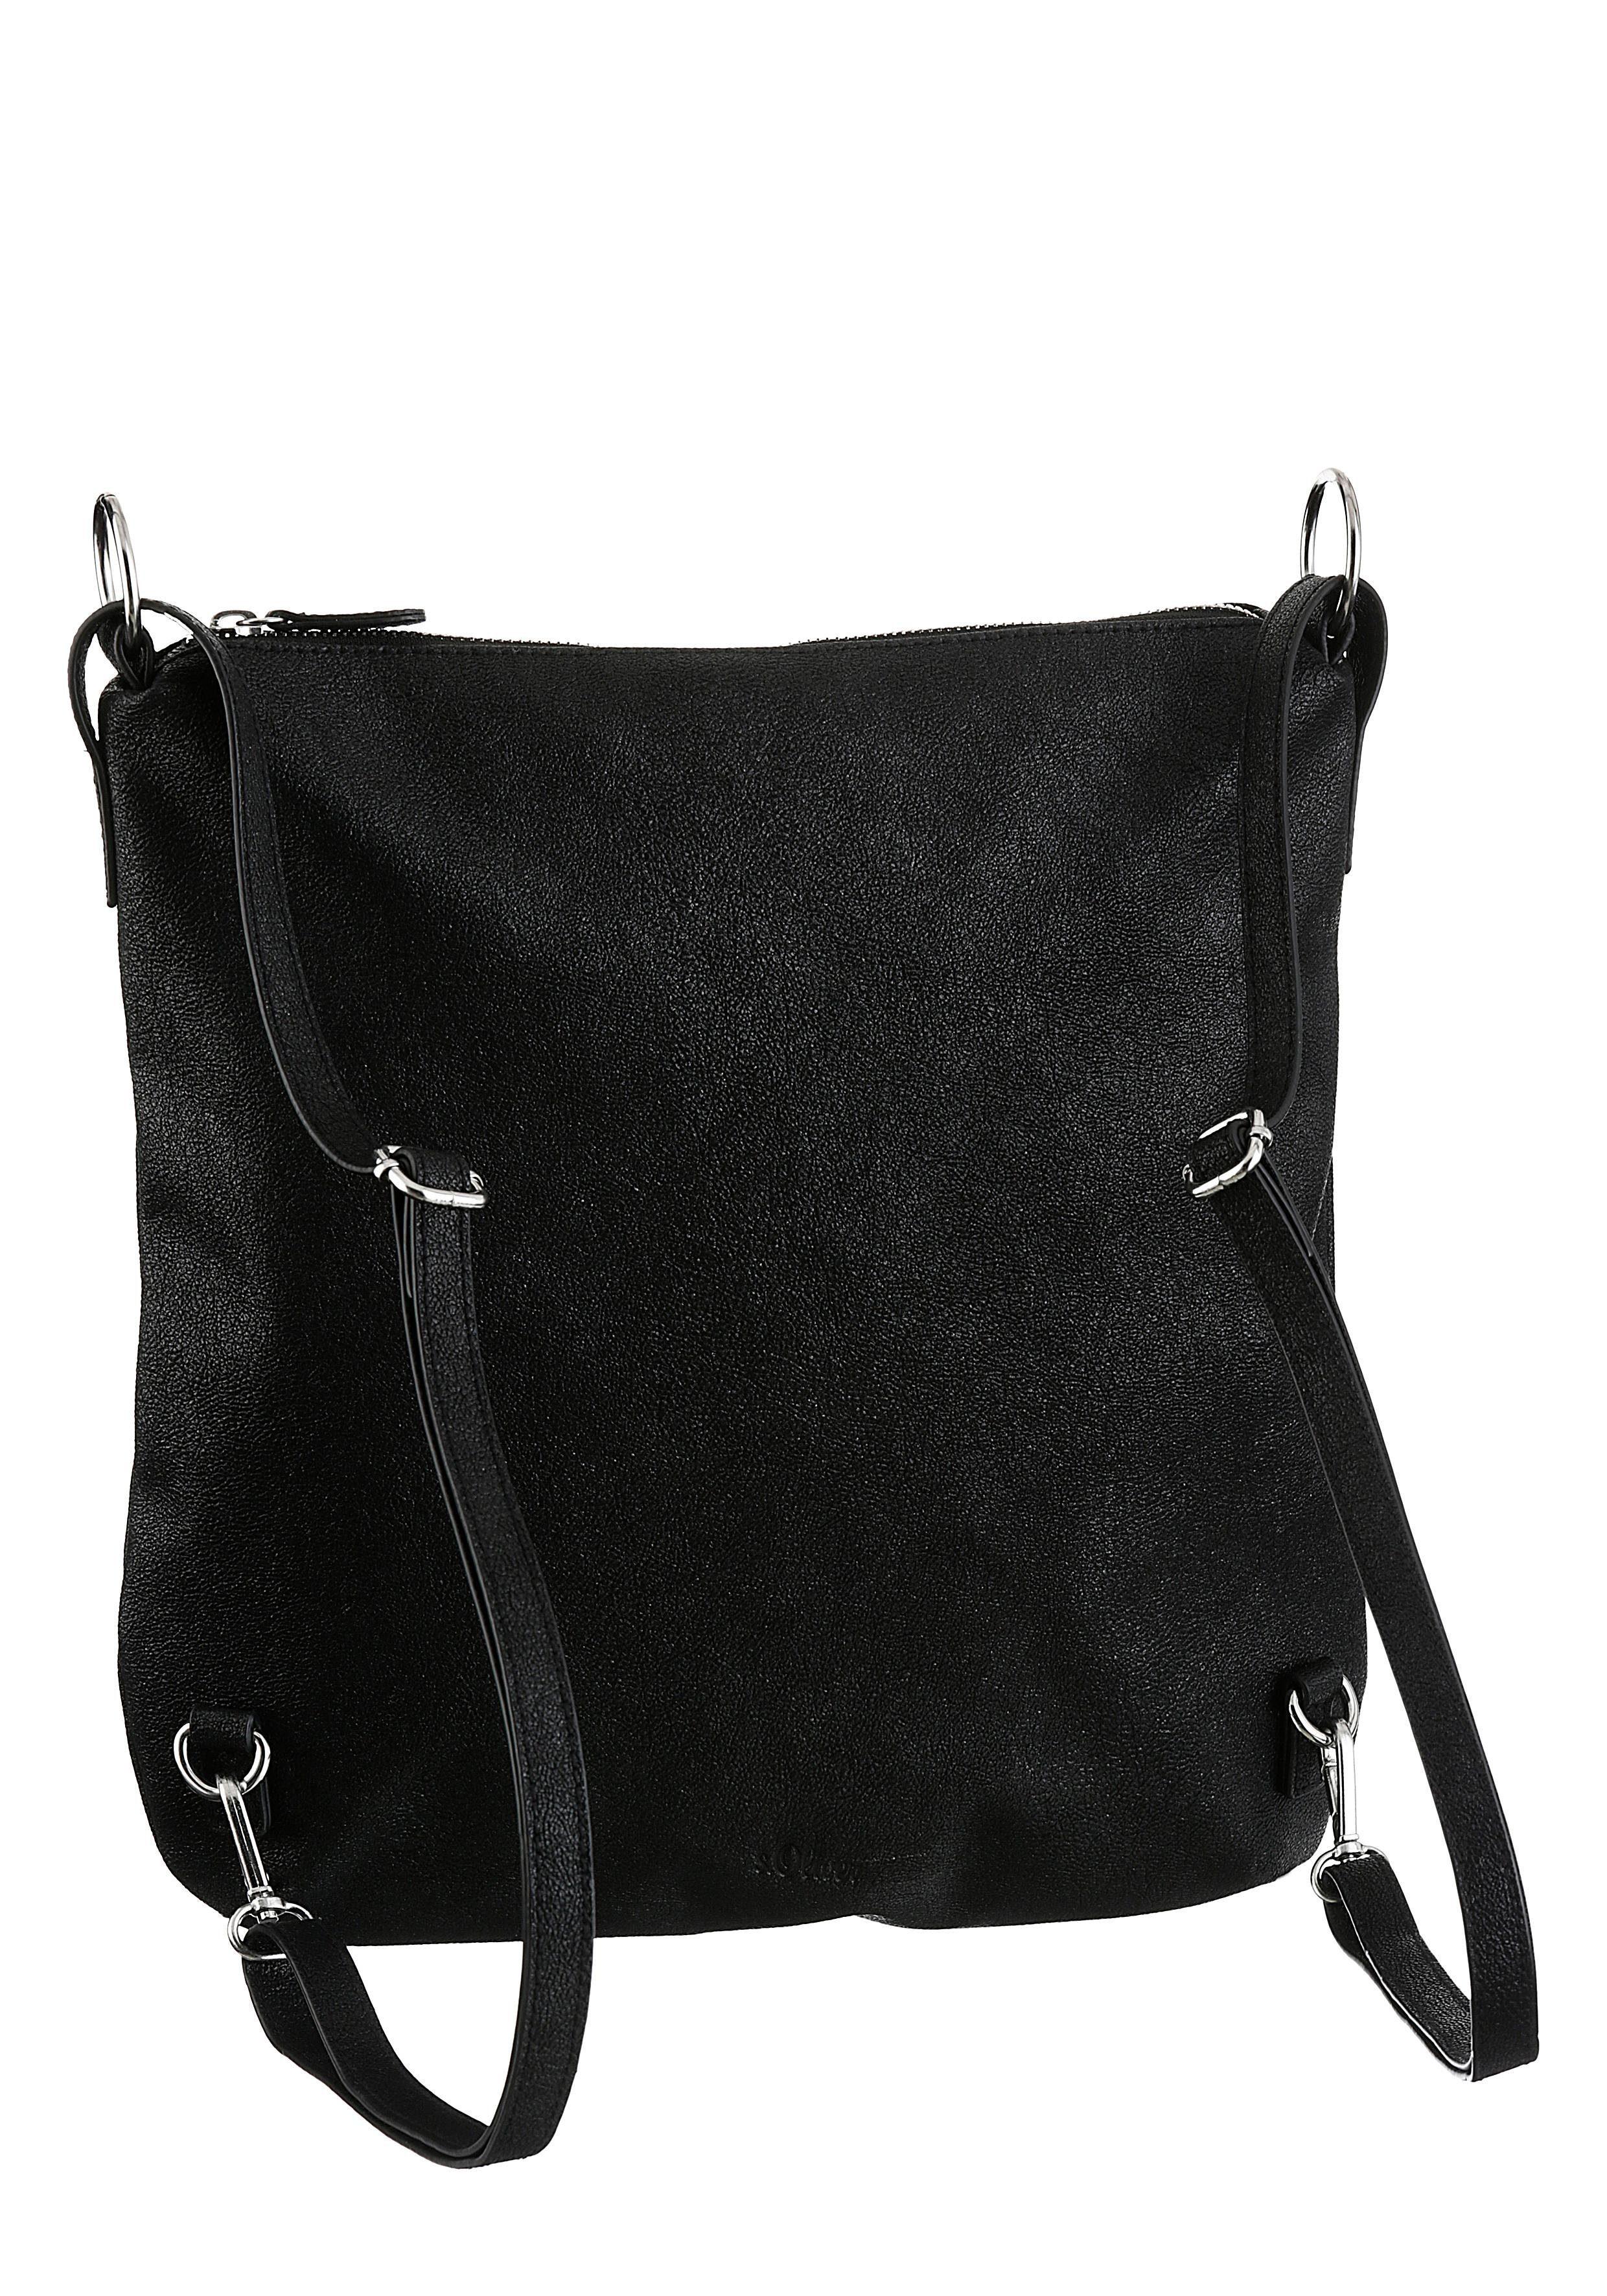 Label Hobo S Red Auch oliver Bag Tragbar Cityrucksack Als qwwTUzEOx